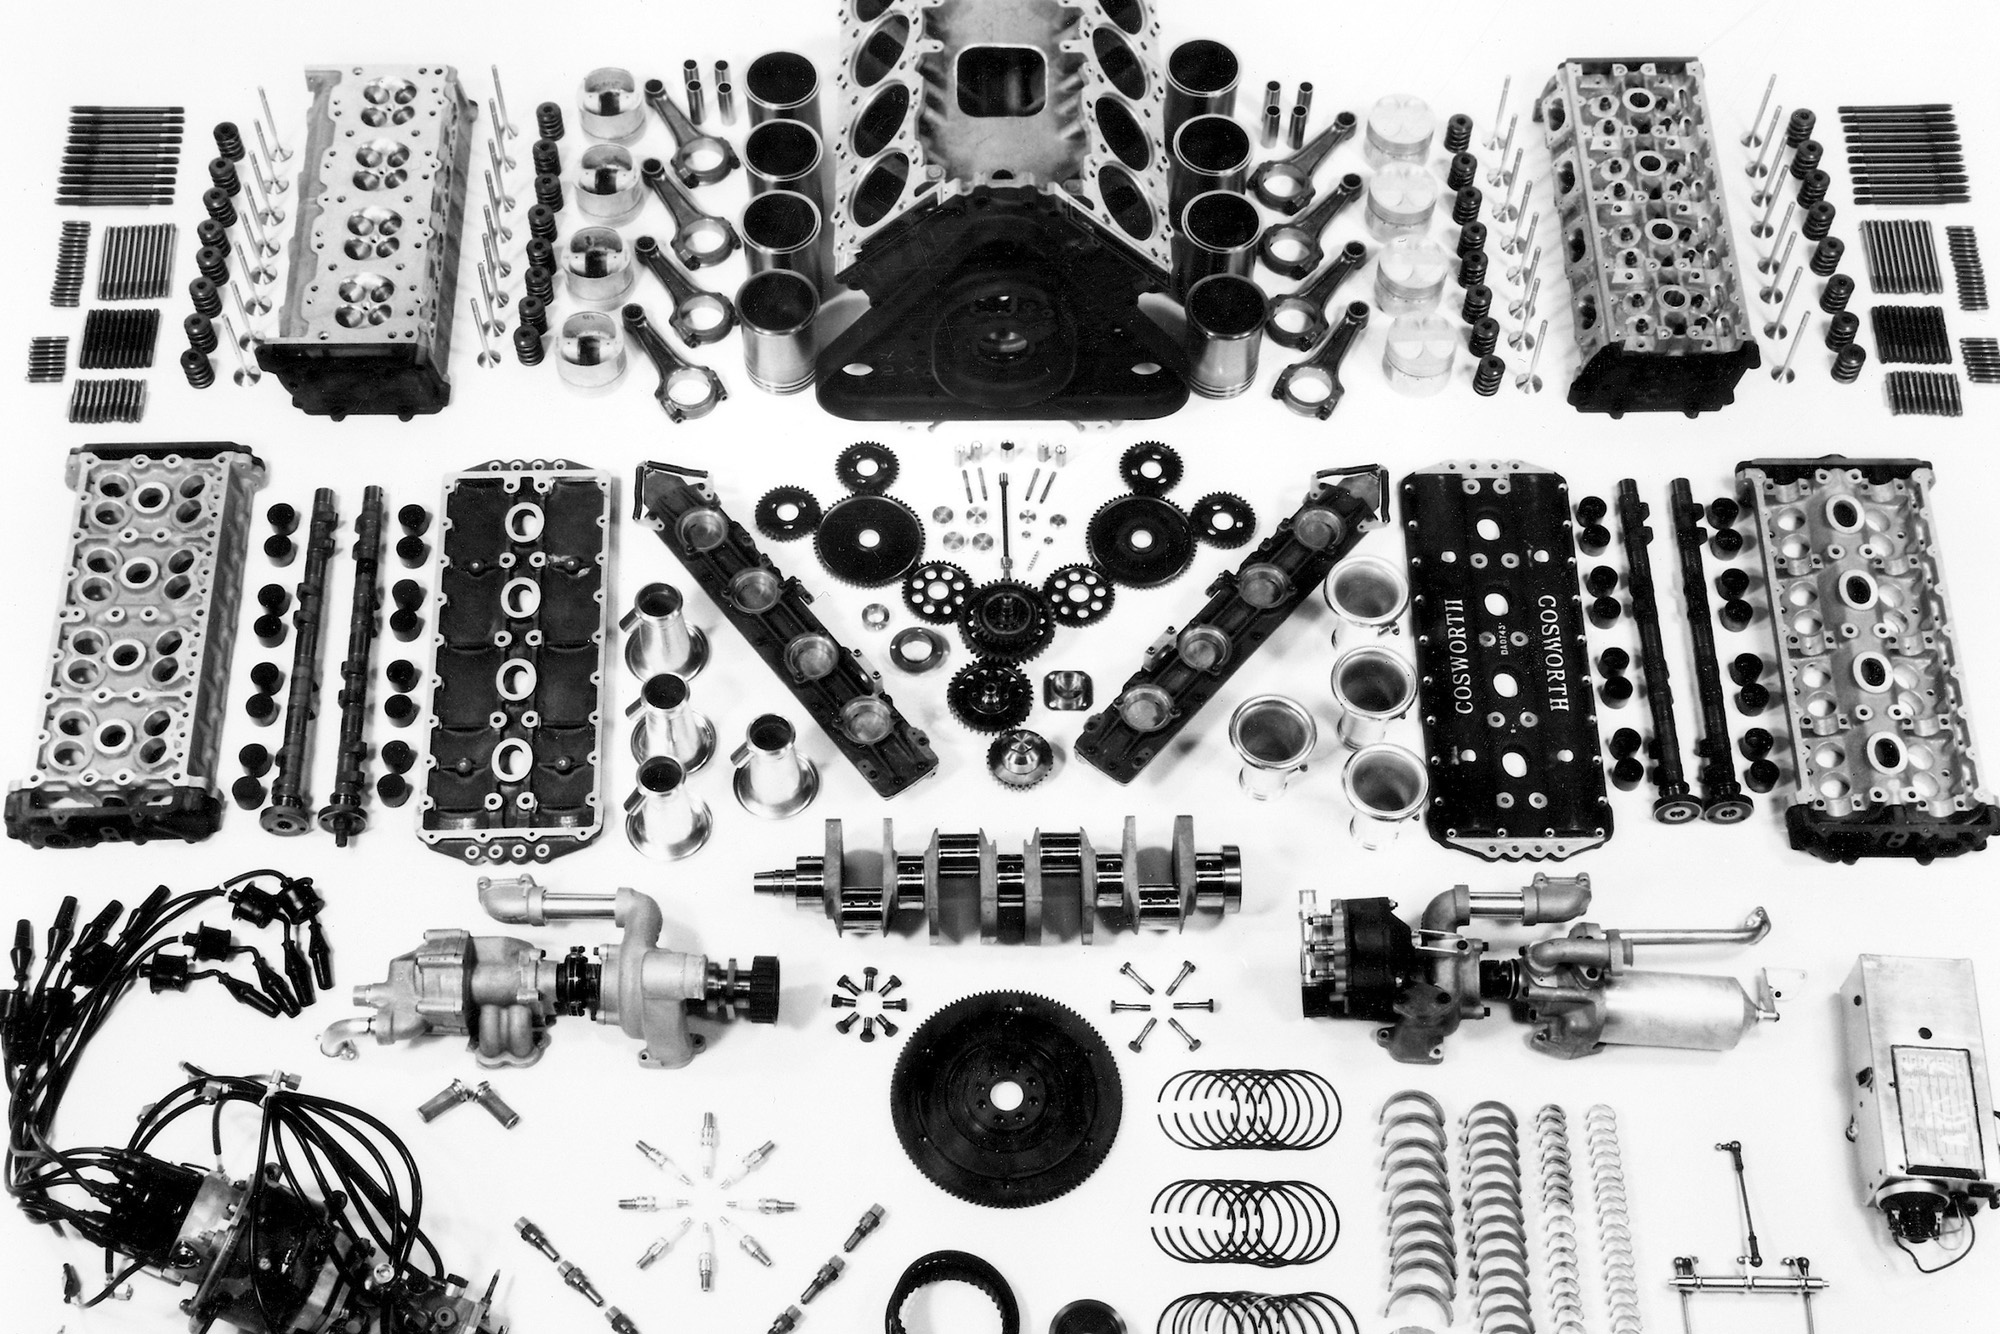 Cosworth DFV in parts